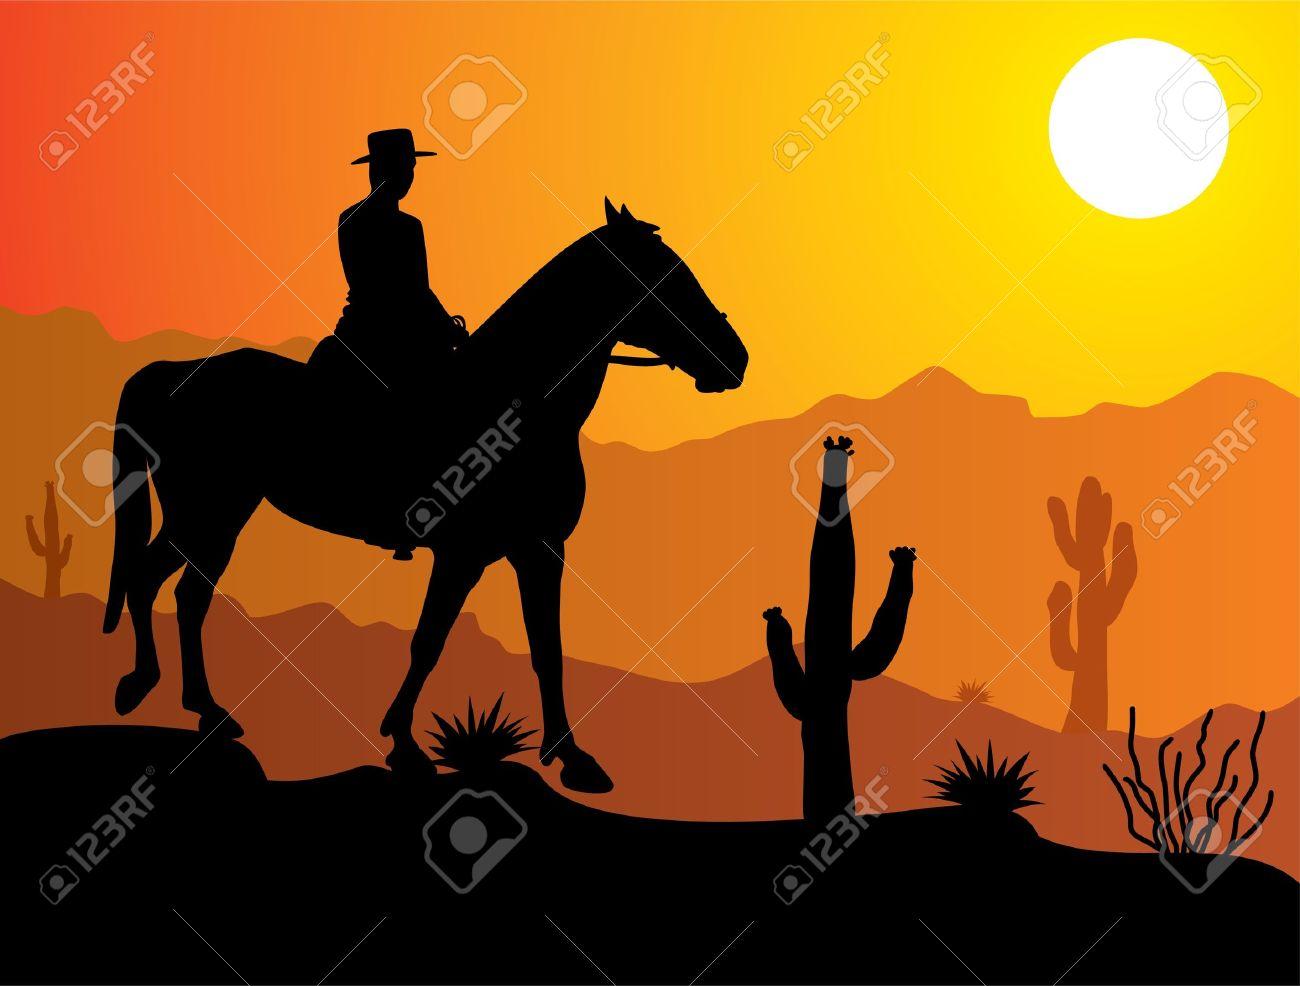 vector man on the horse in desert at sunrise or sunset Stock Vector - 10036531